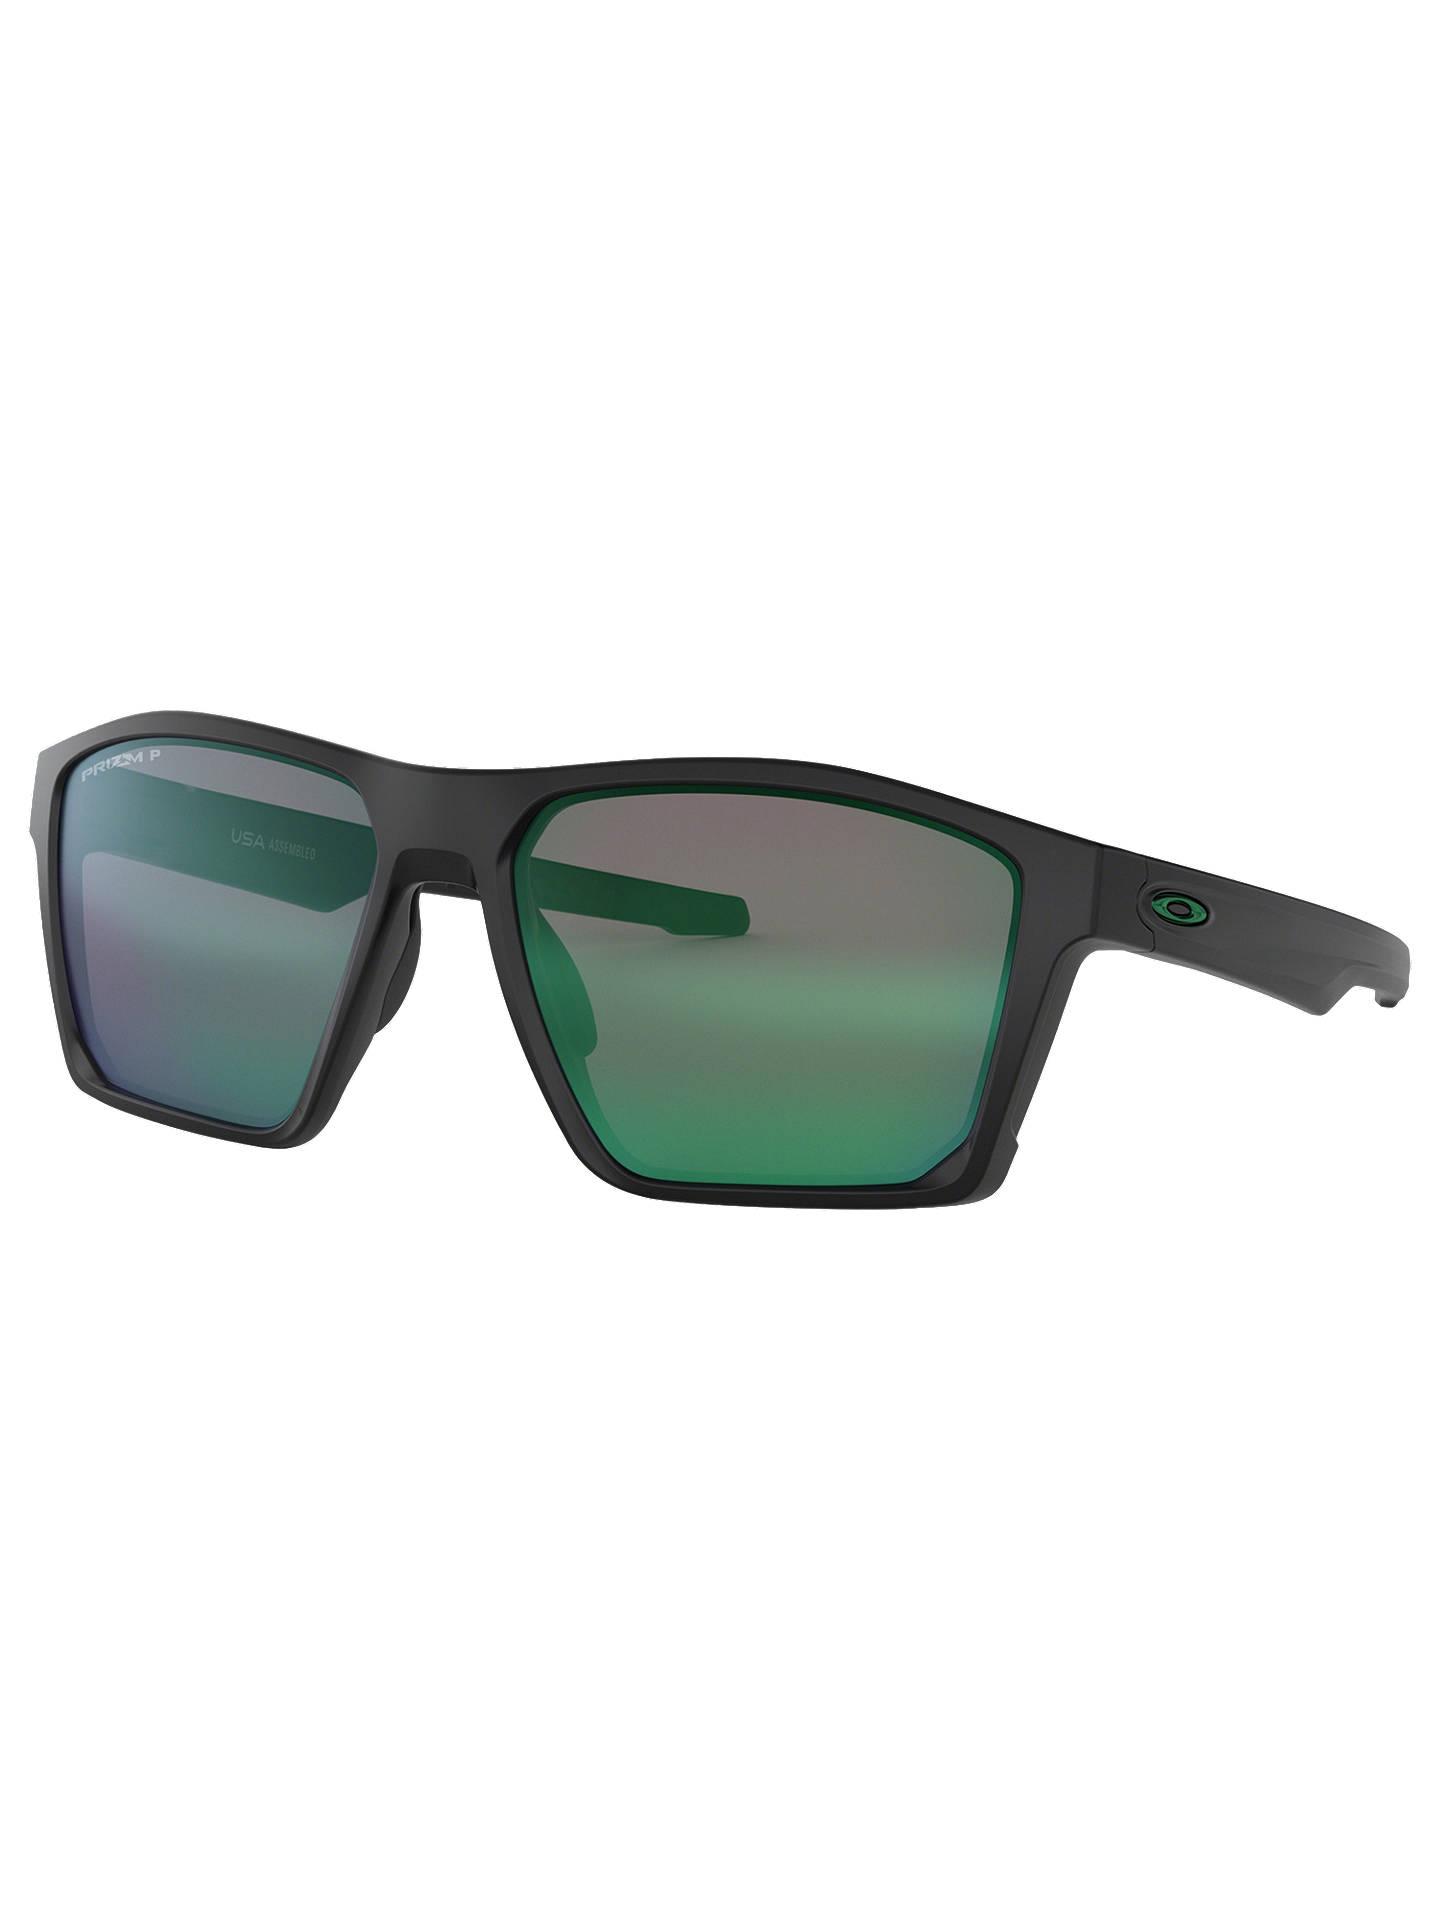 b975f5f034b5 Oakley OO9397 Men s Targetline Prizm Polarised Square Sunglasses ...